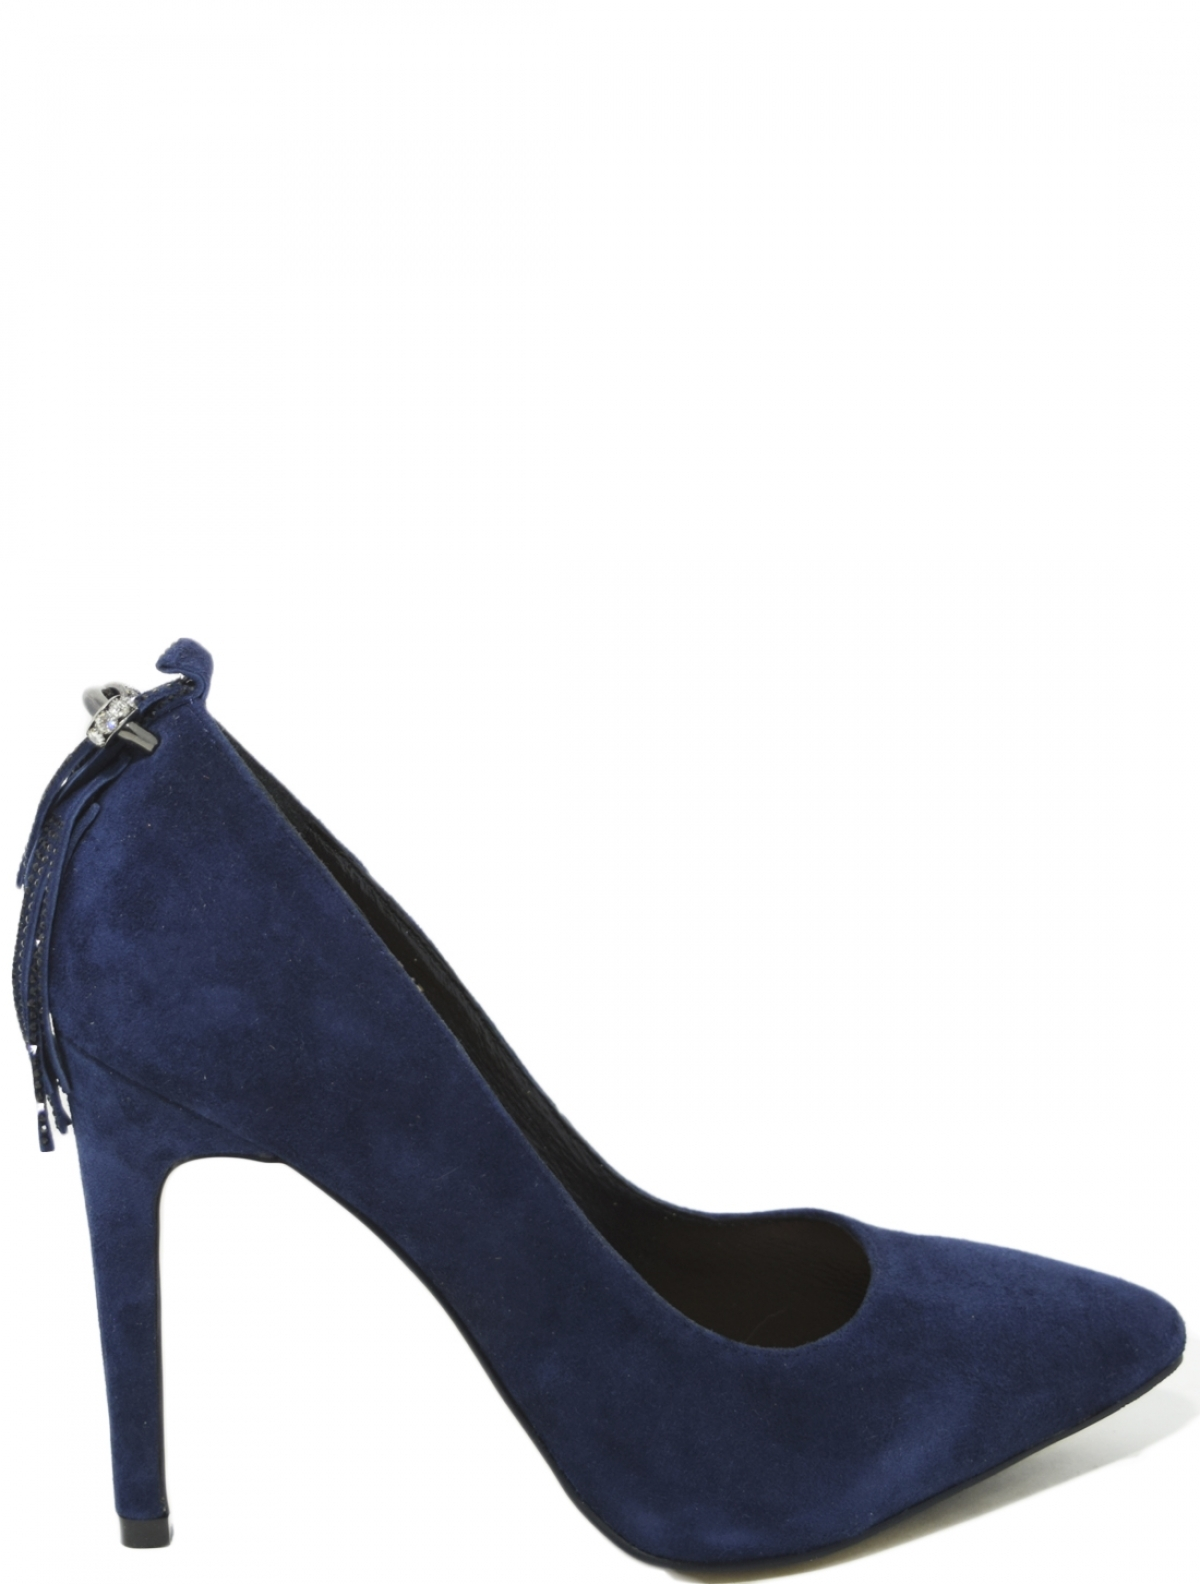 CARDICIANA F392-2 женские туфли